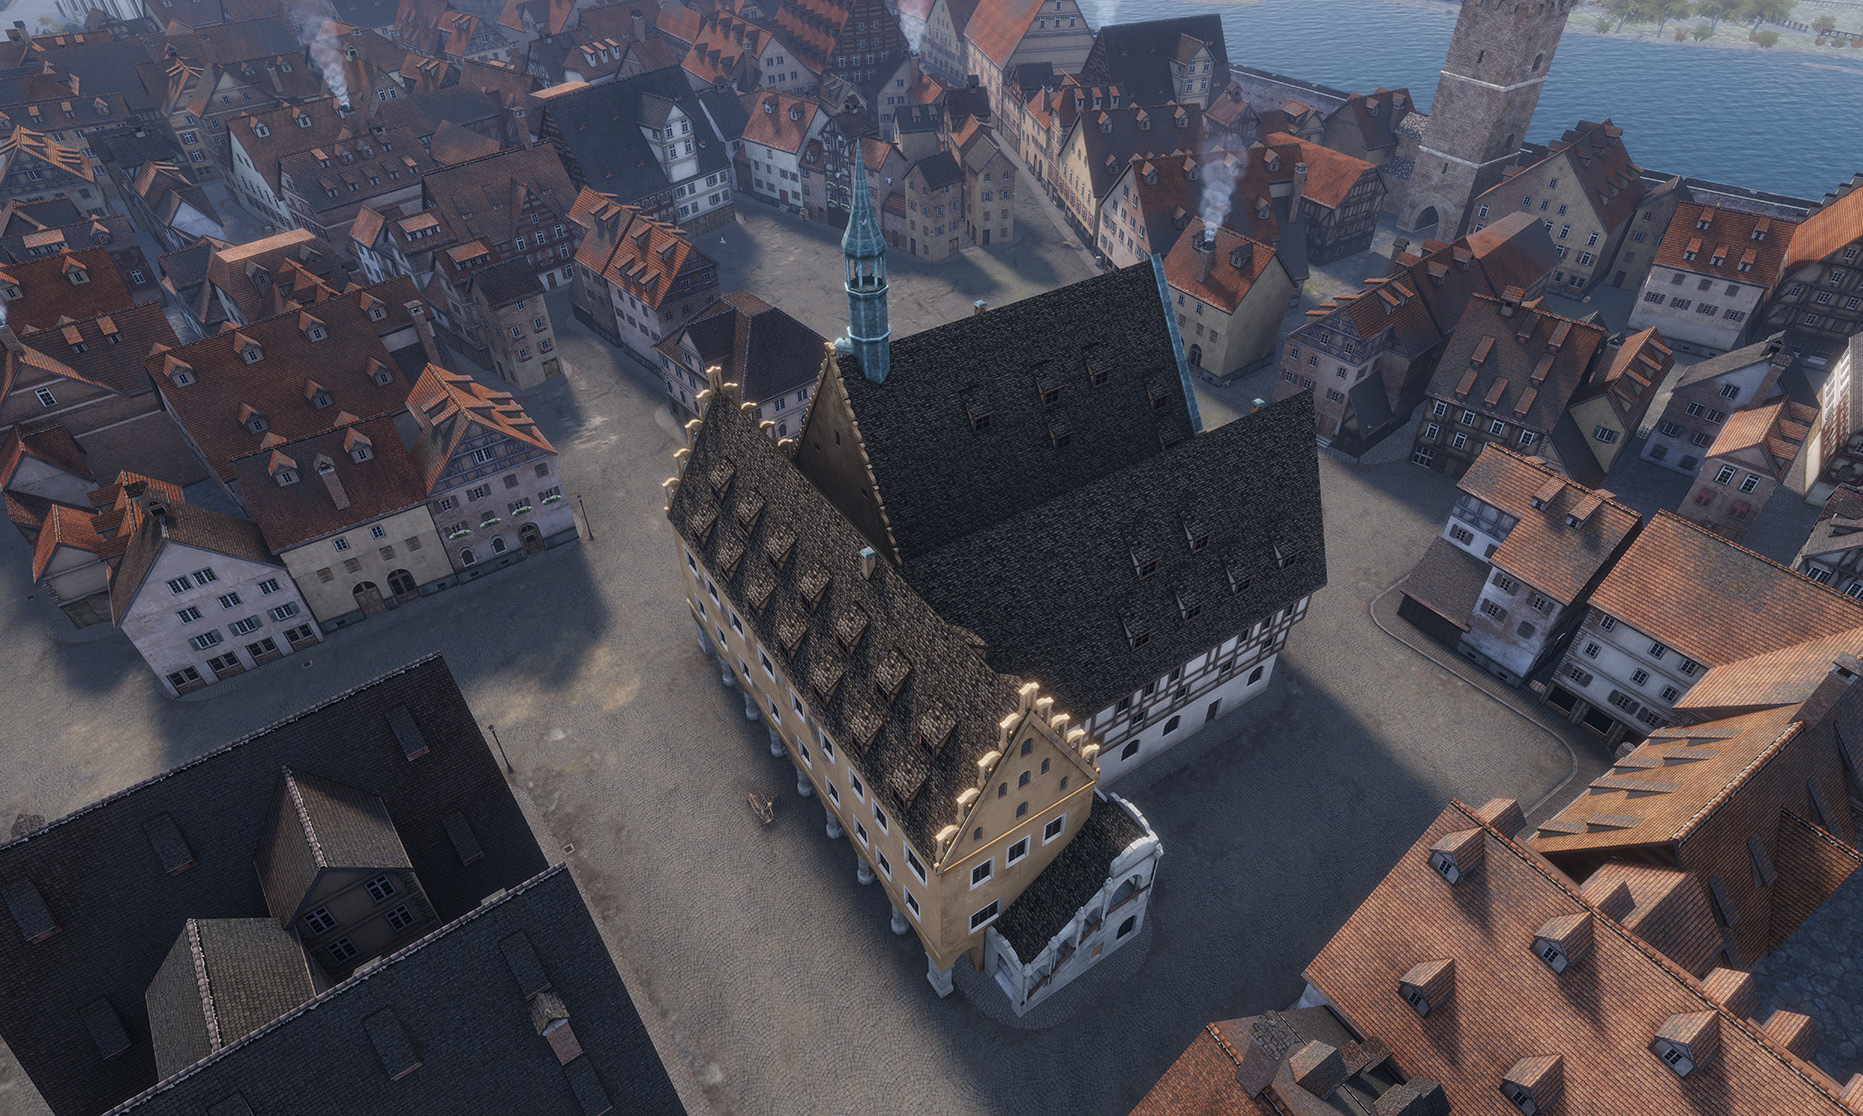 Ulm 2